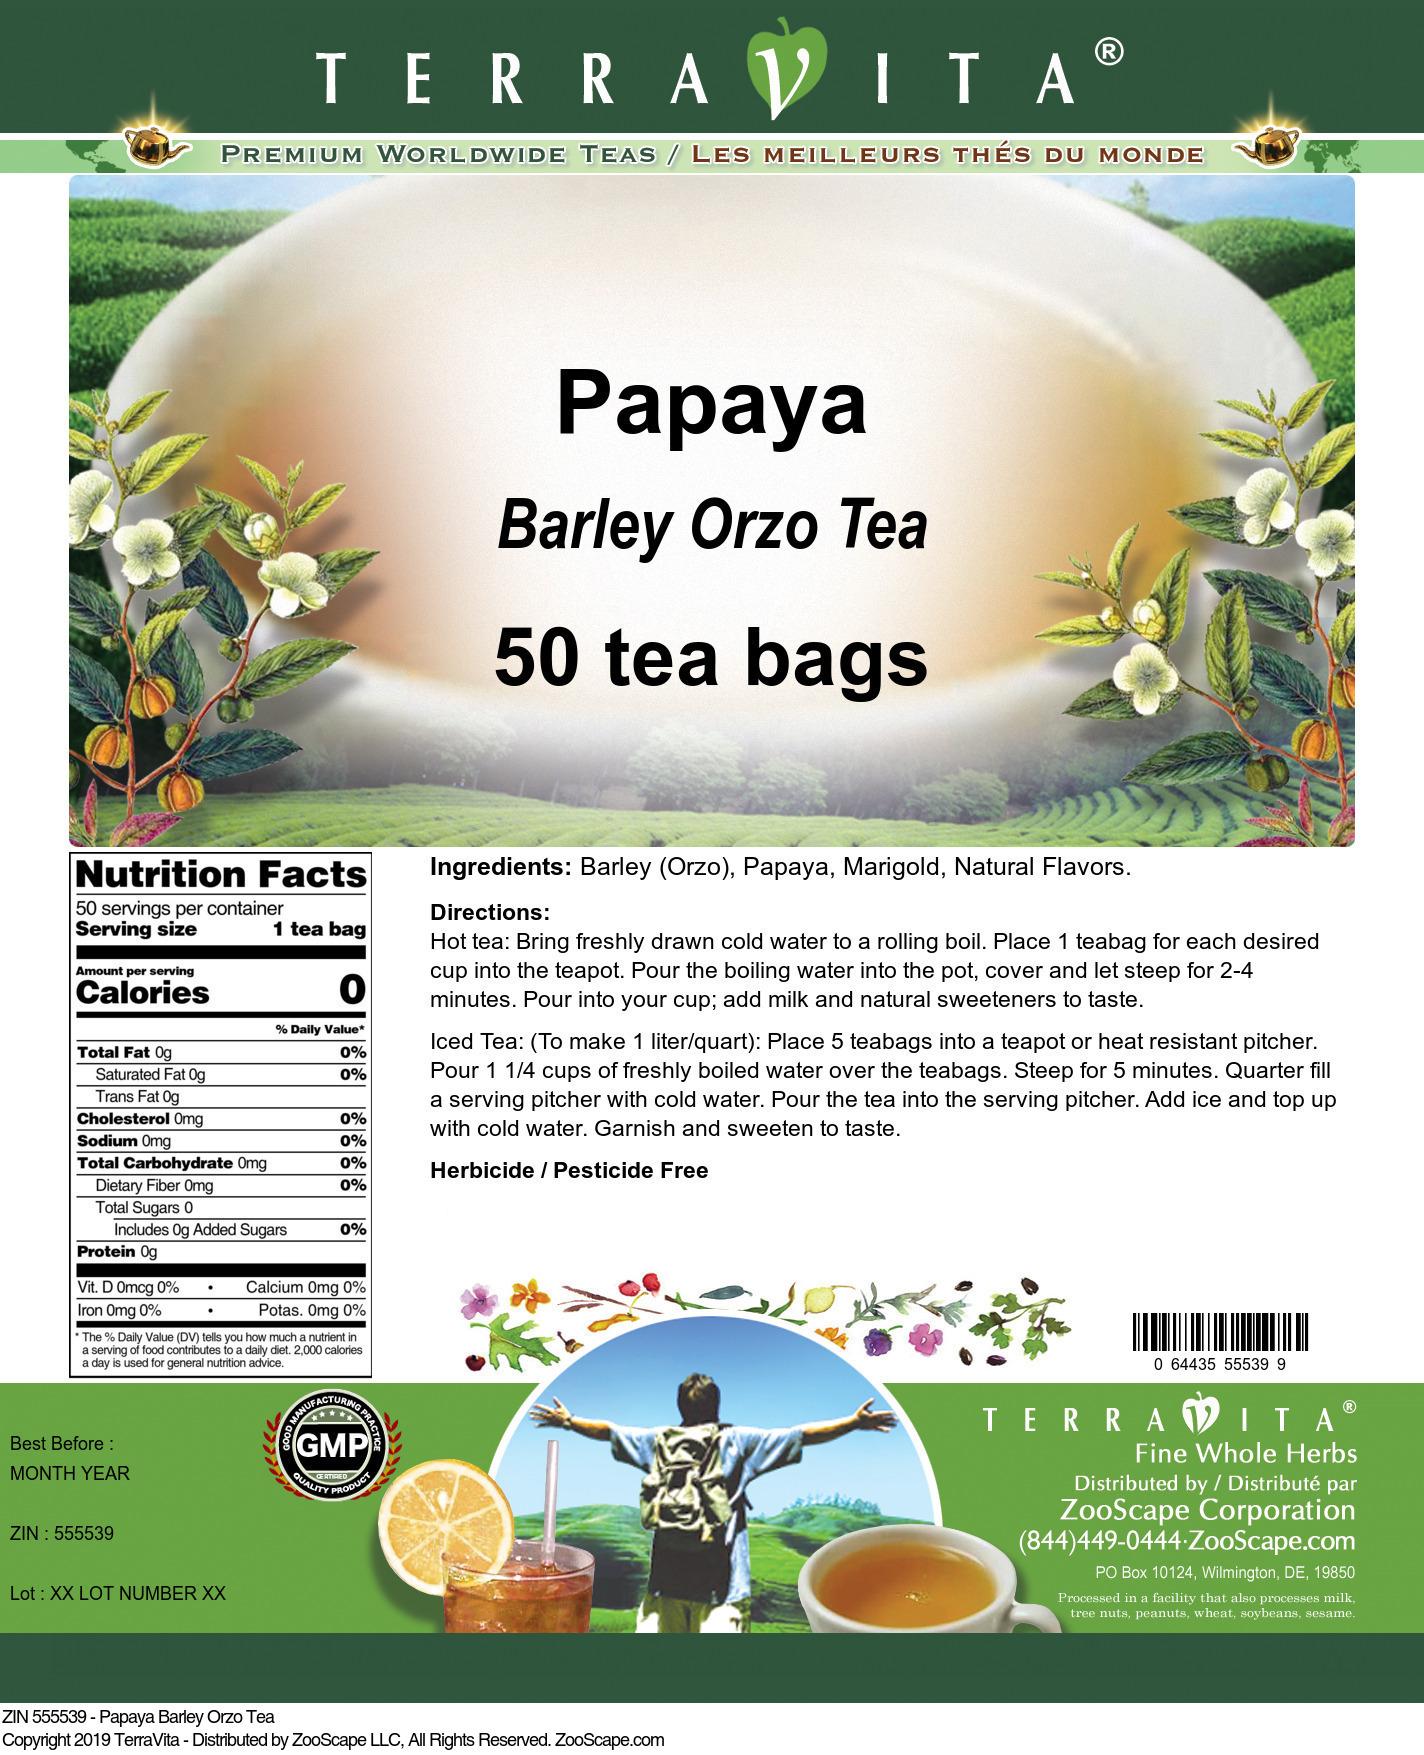 Papaya Barley Orzo Tea